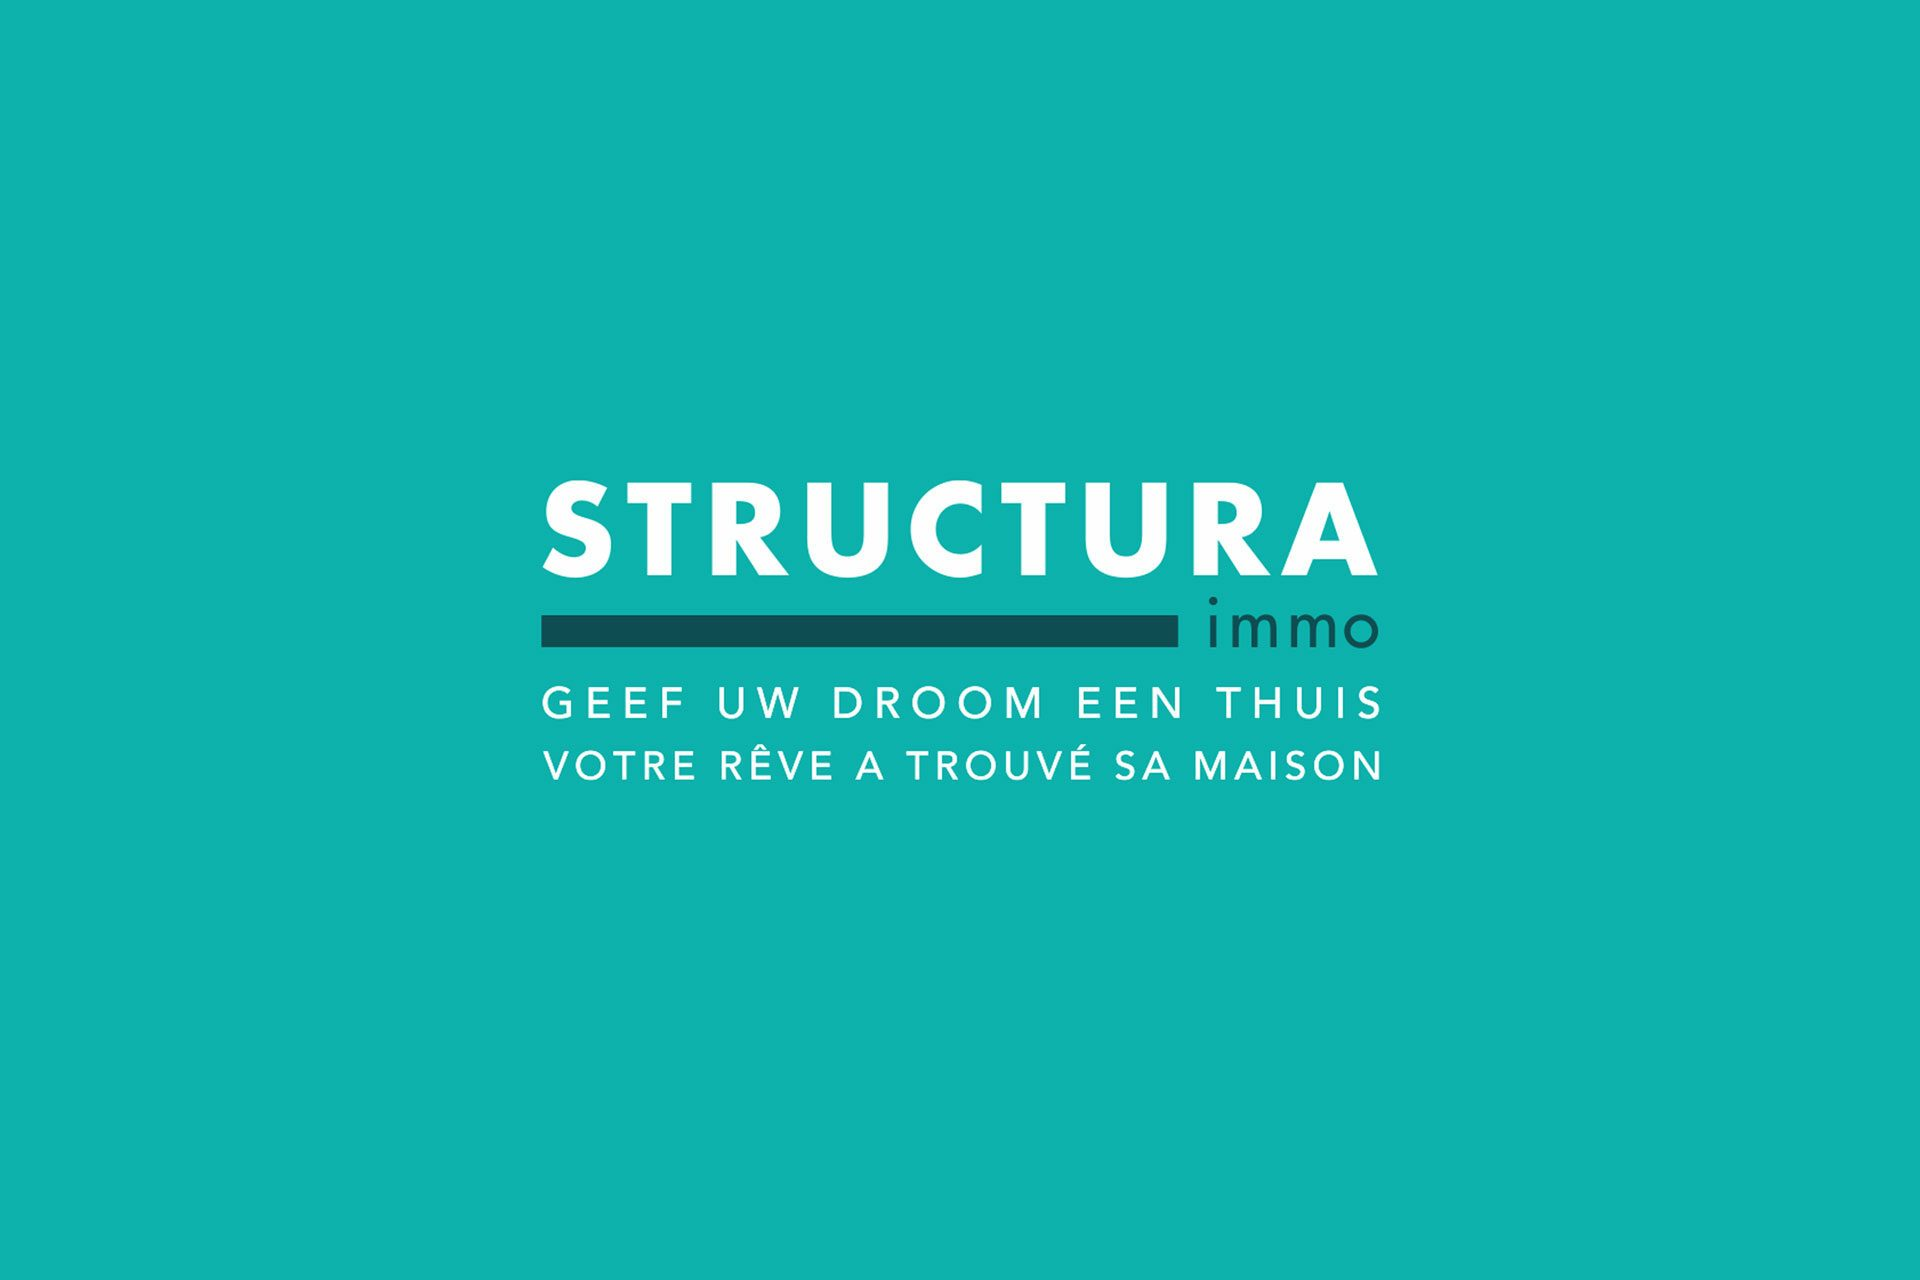 Afbeelding Structura Brand Identity